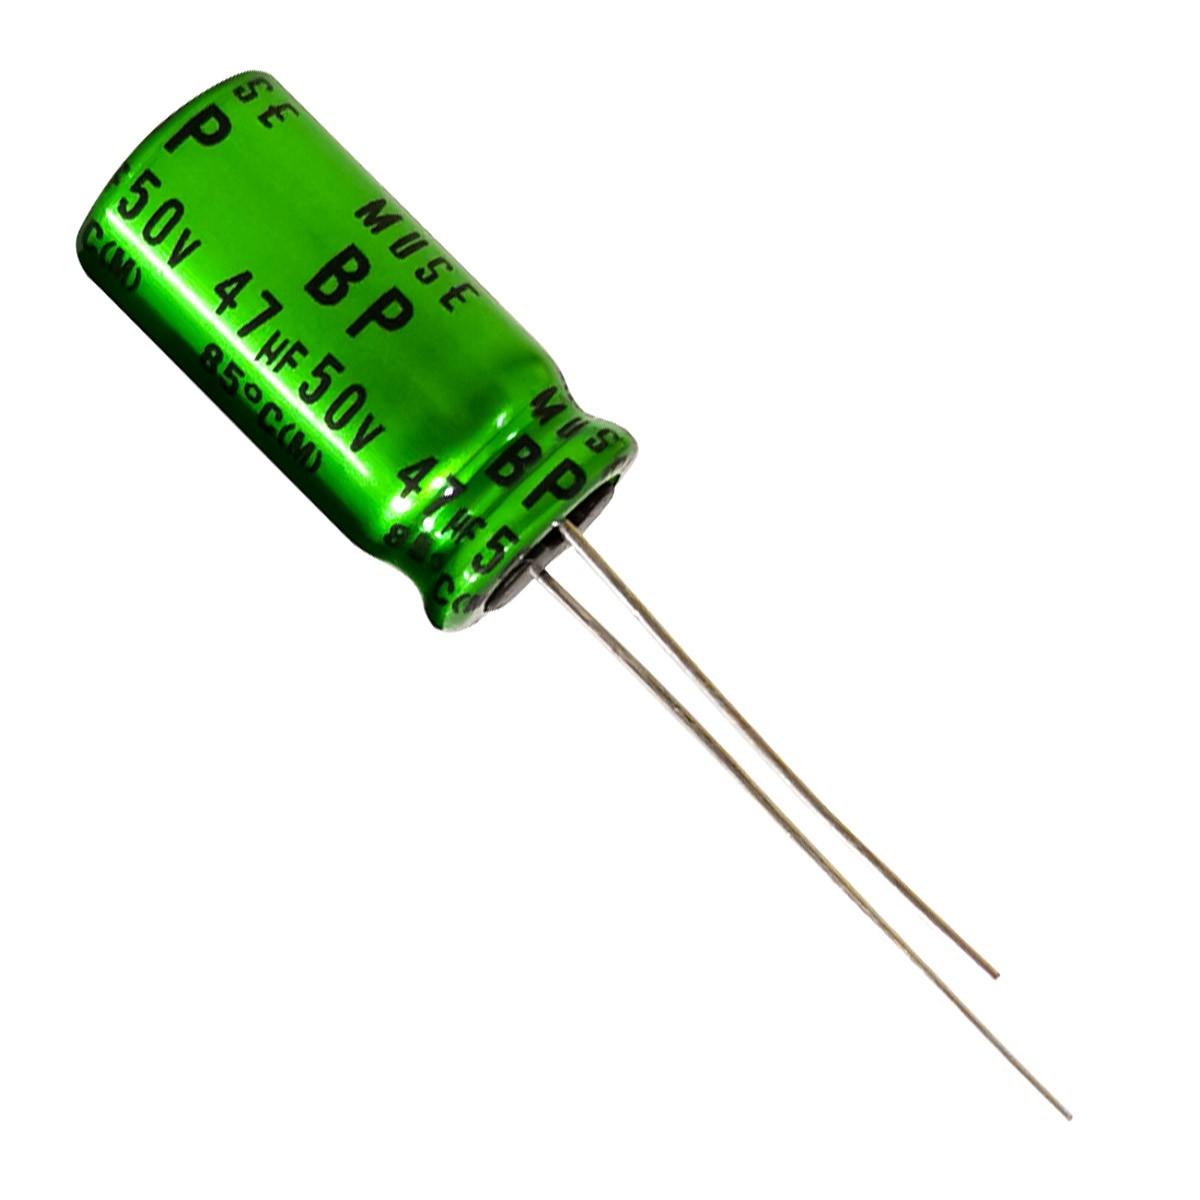 NICHICON ES MUSE Condensateur Audio Audiophile 25V 1000µF